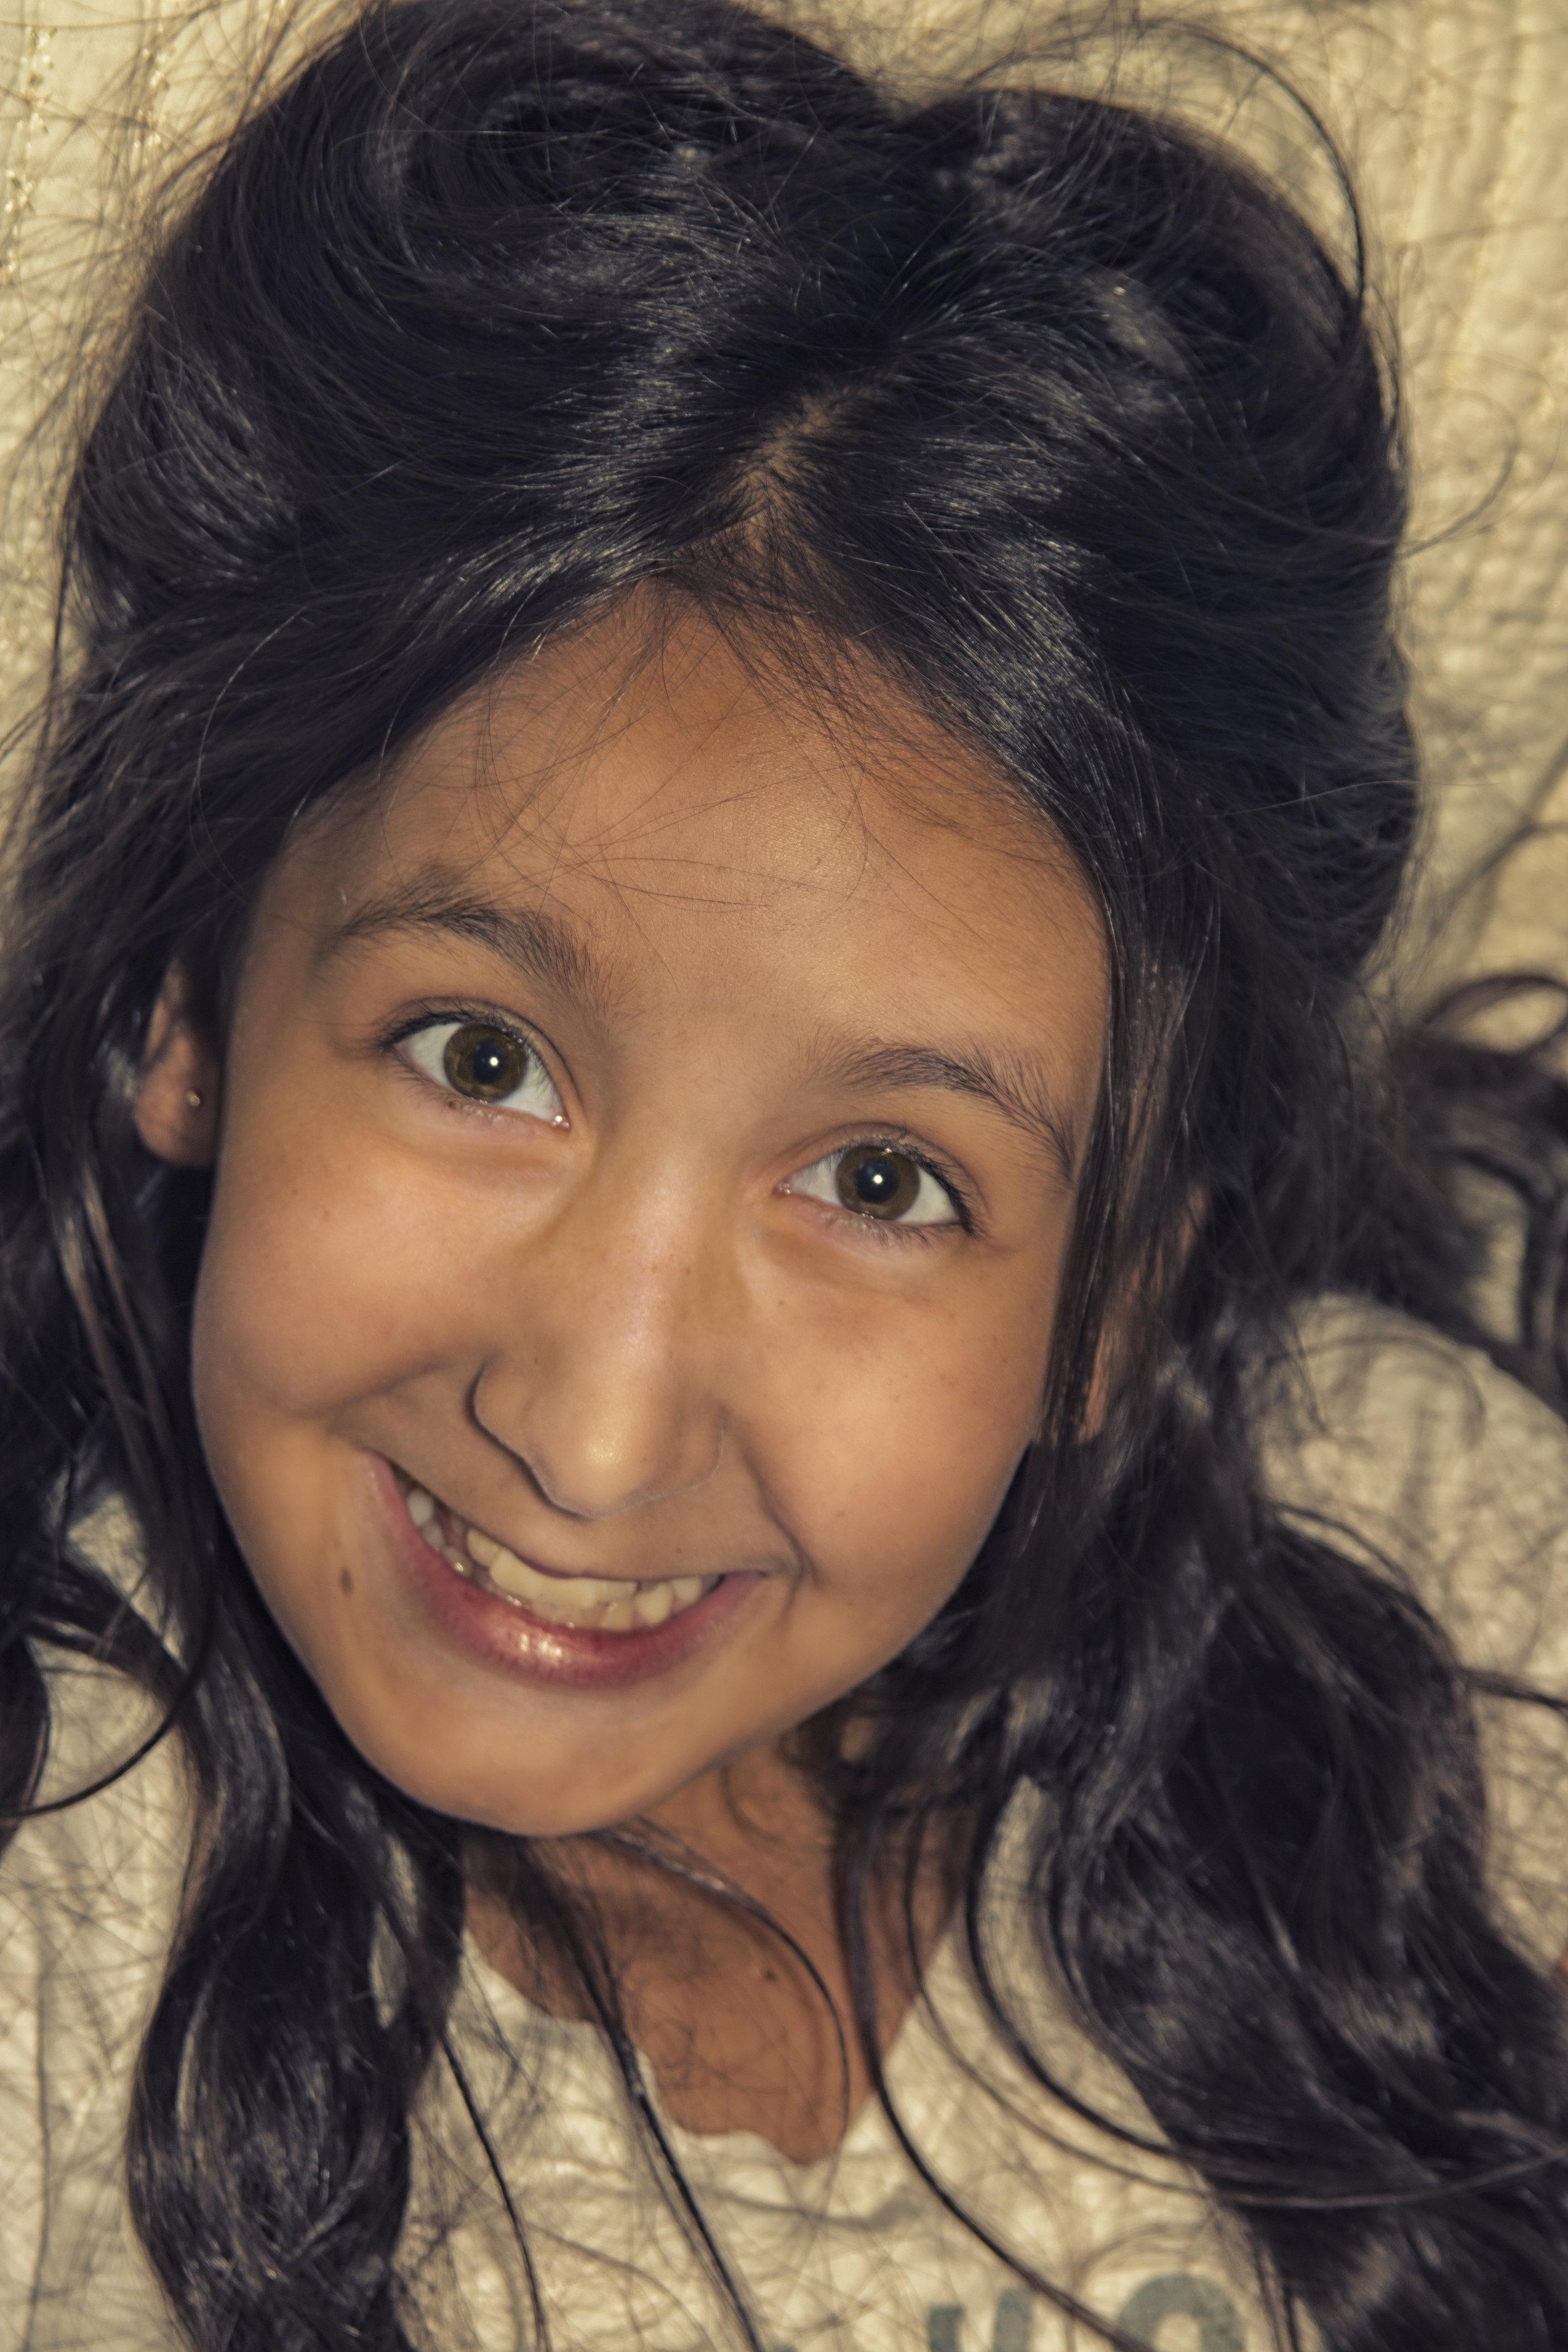 Anja's Smile